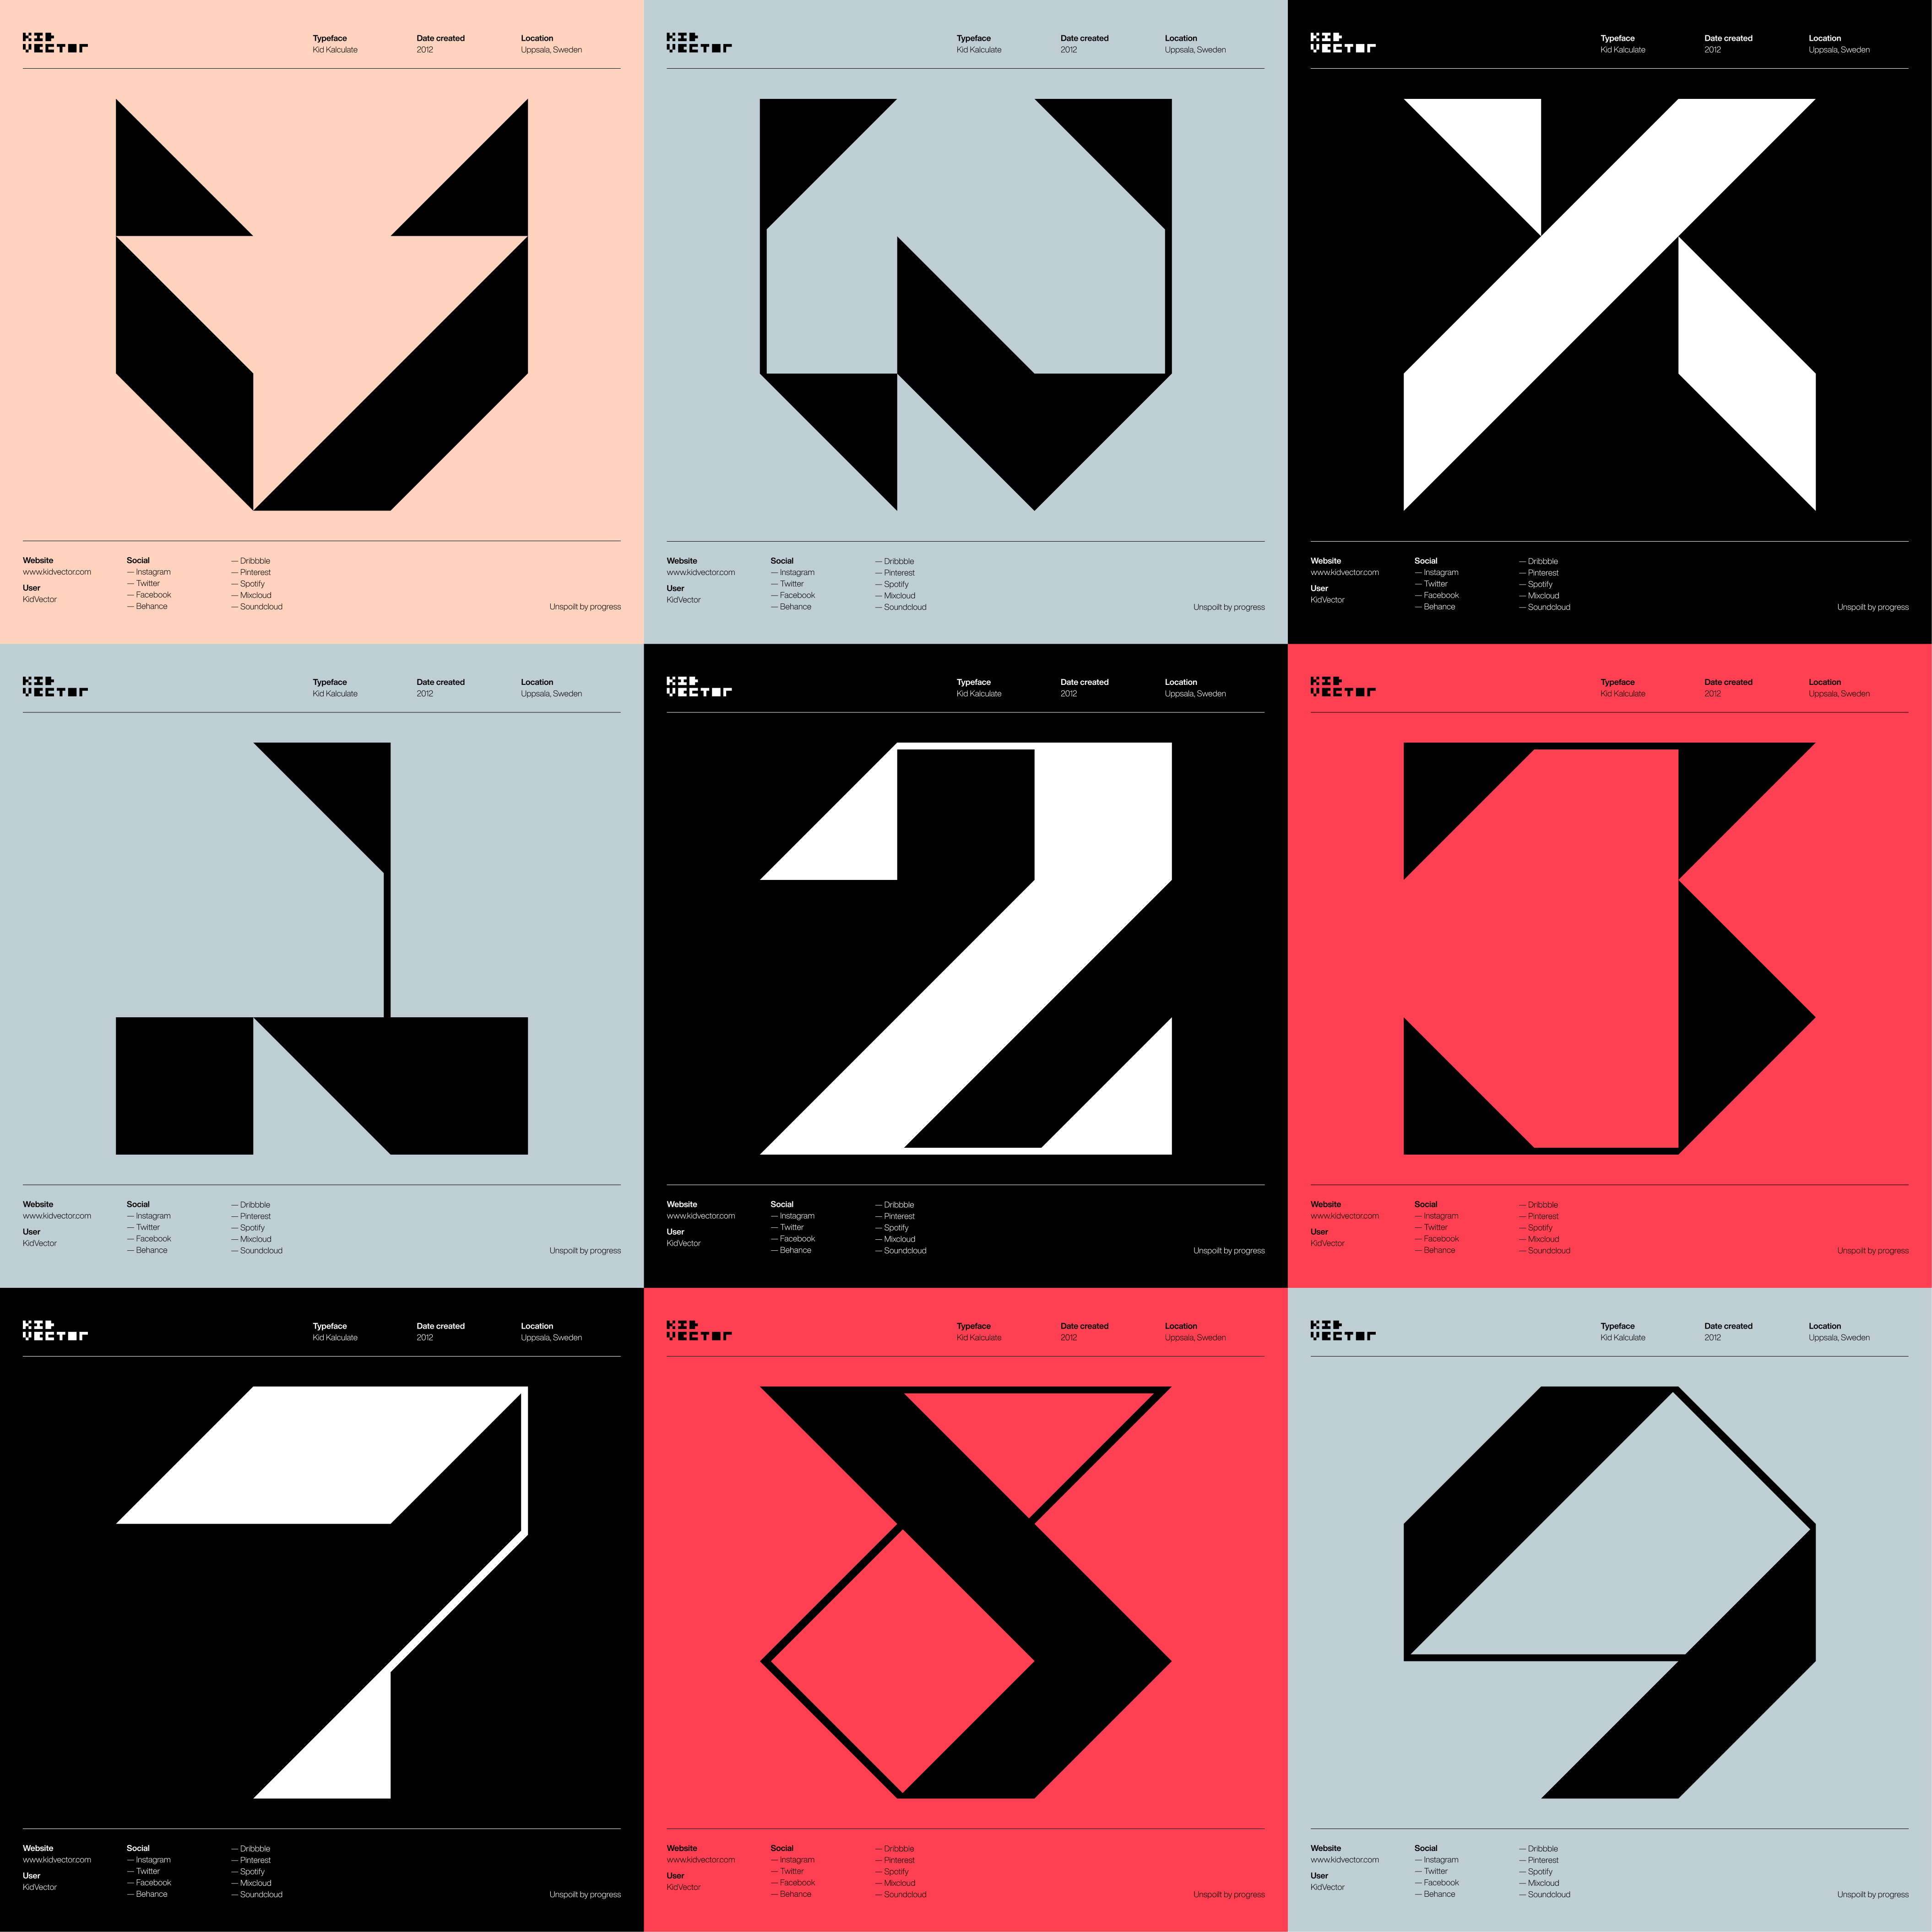 Kid Kalculate — 3 x 3 character grid 4